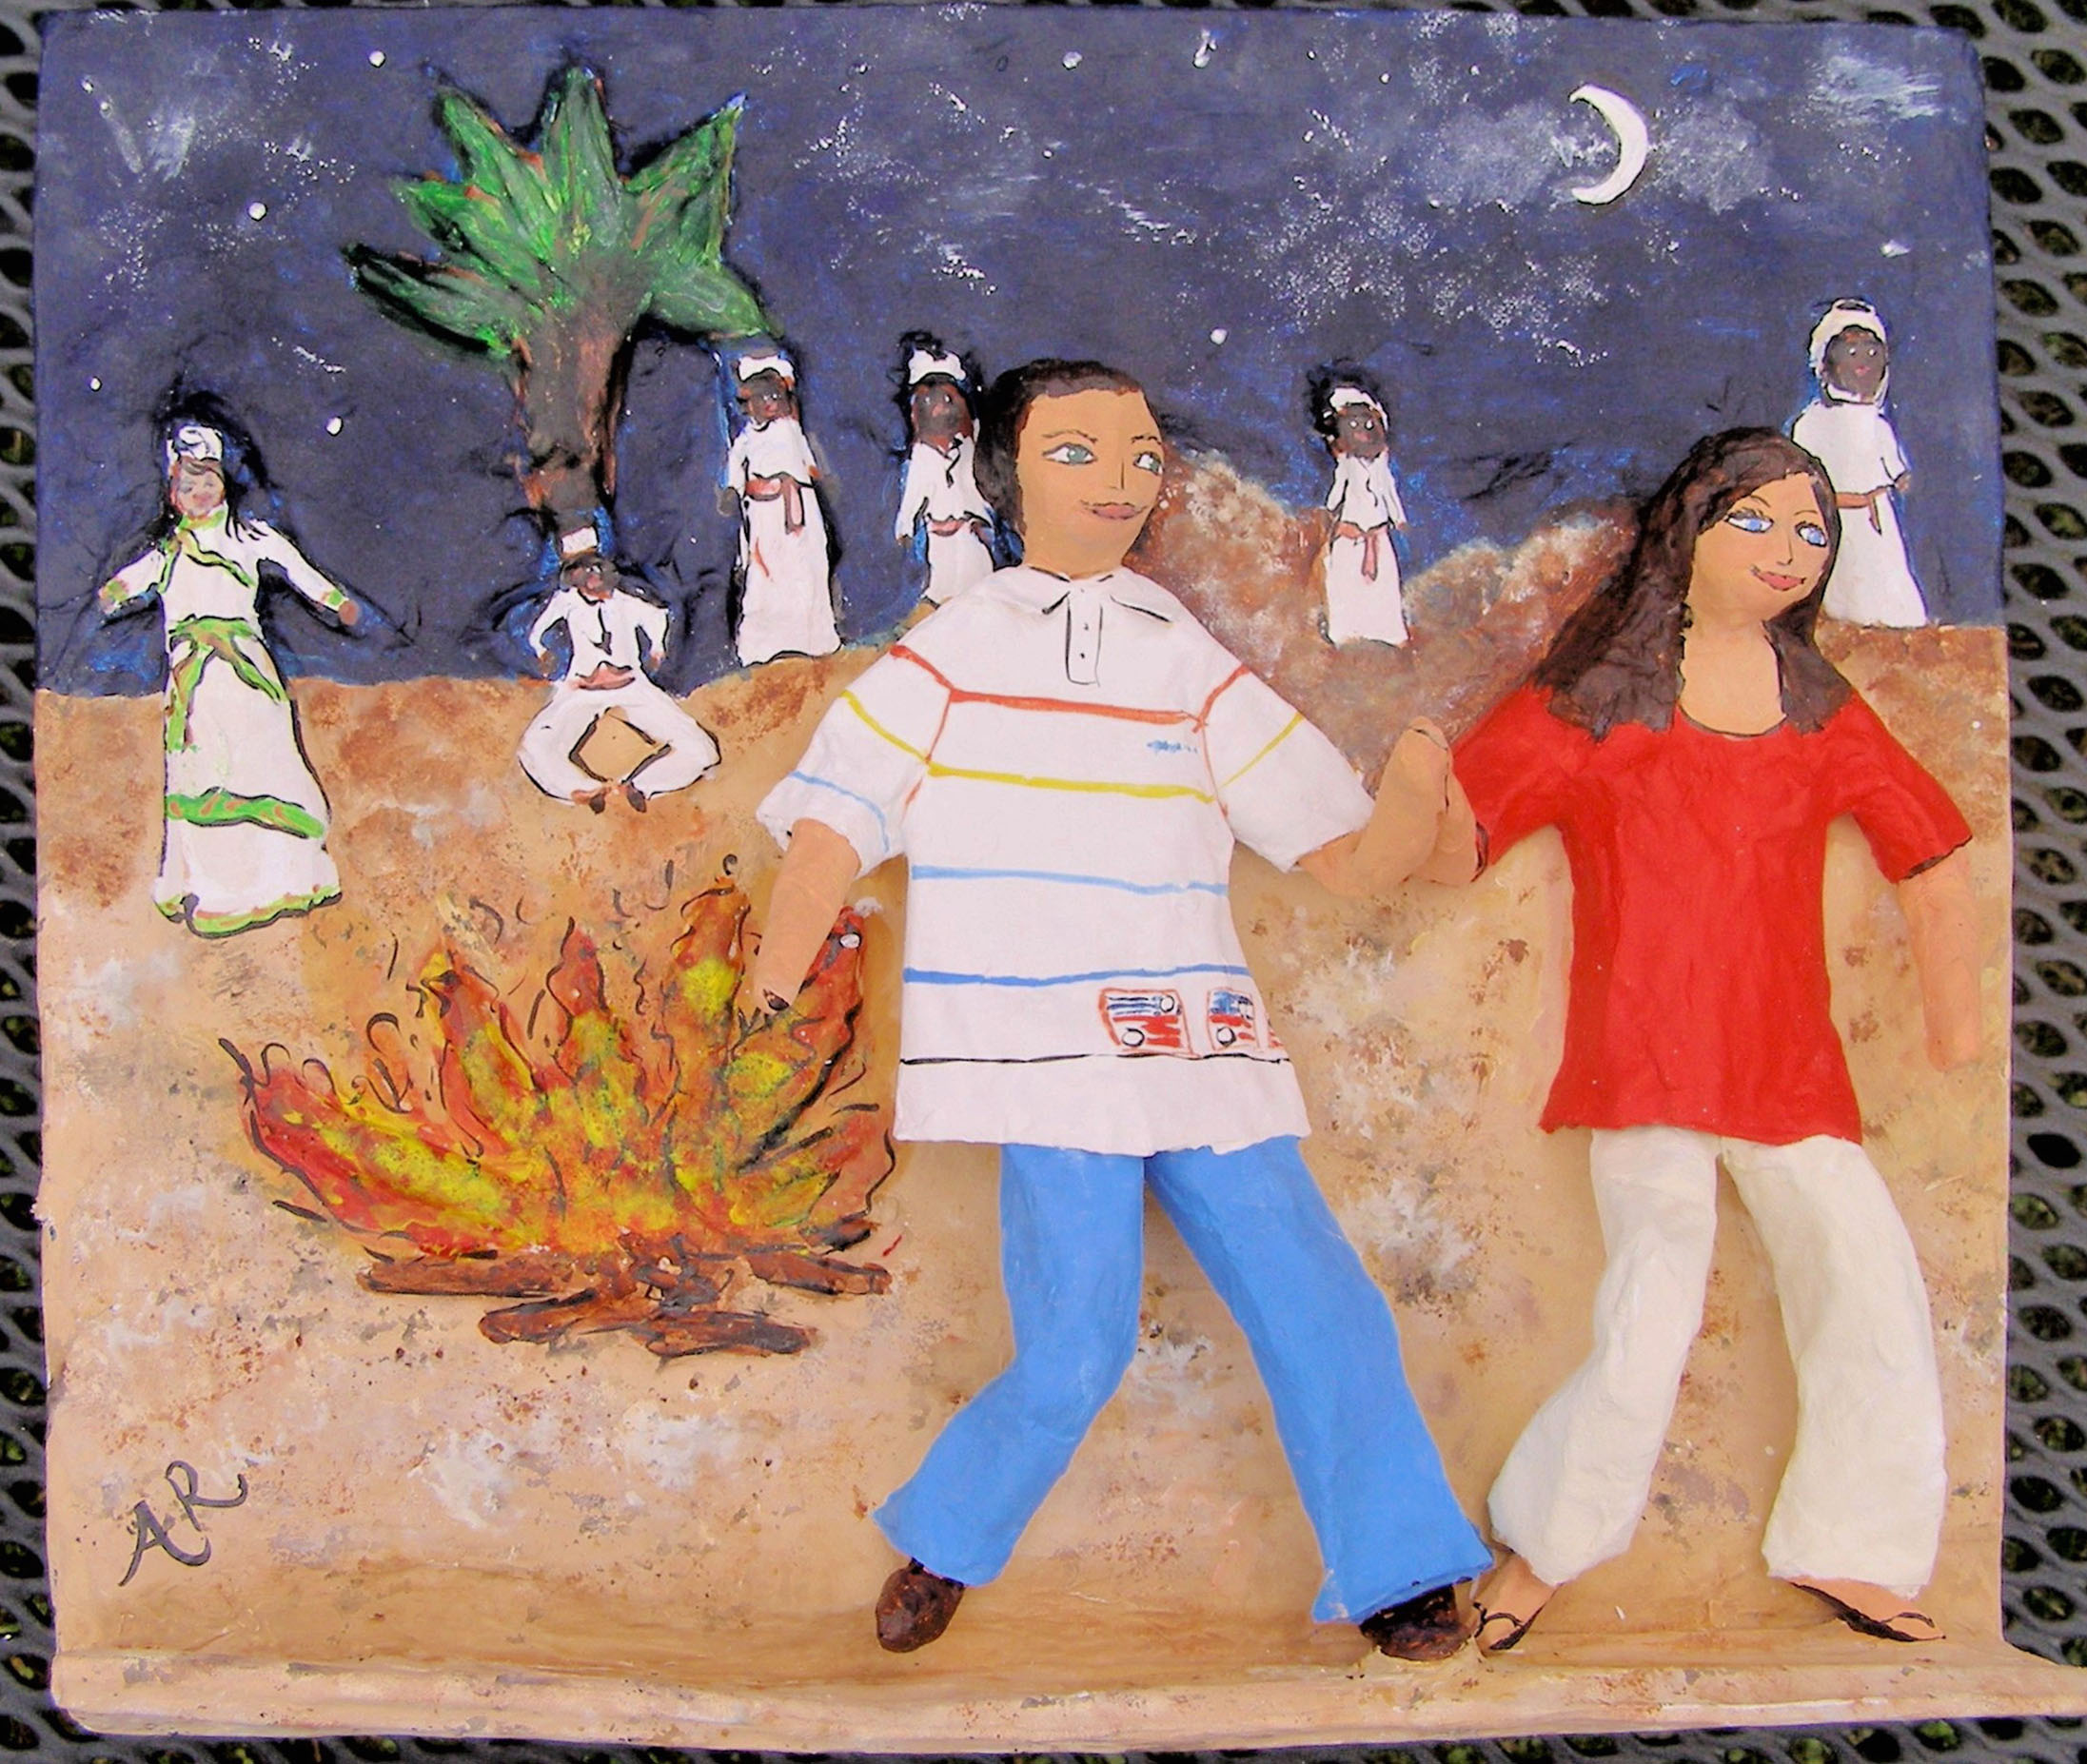 Papier mache sculpture first anniversary Morocco